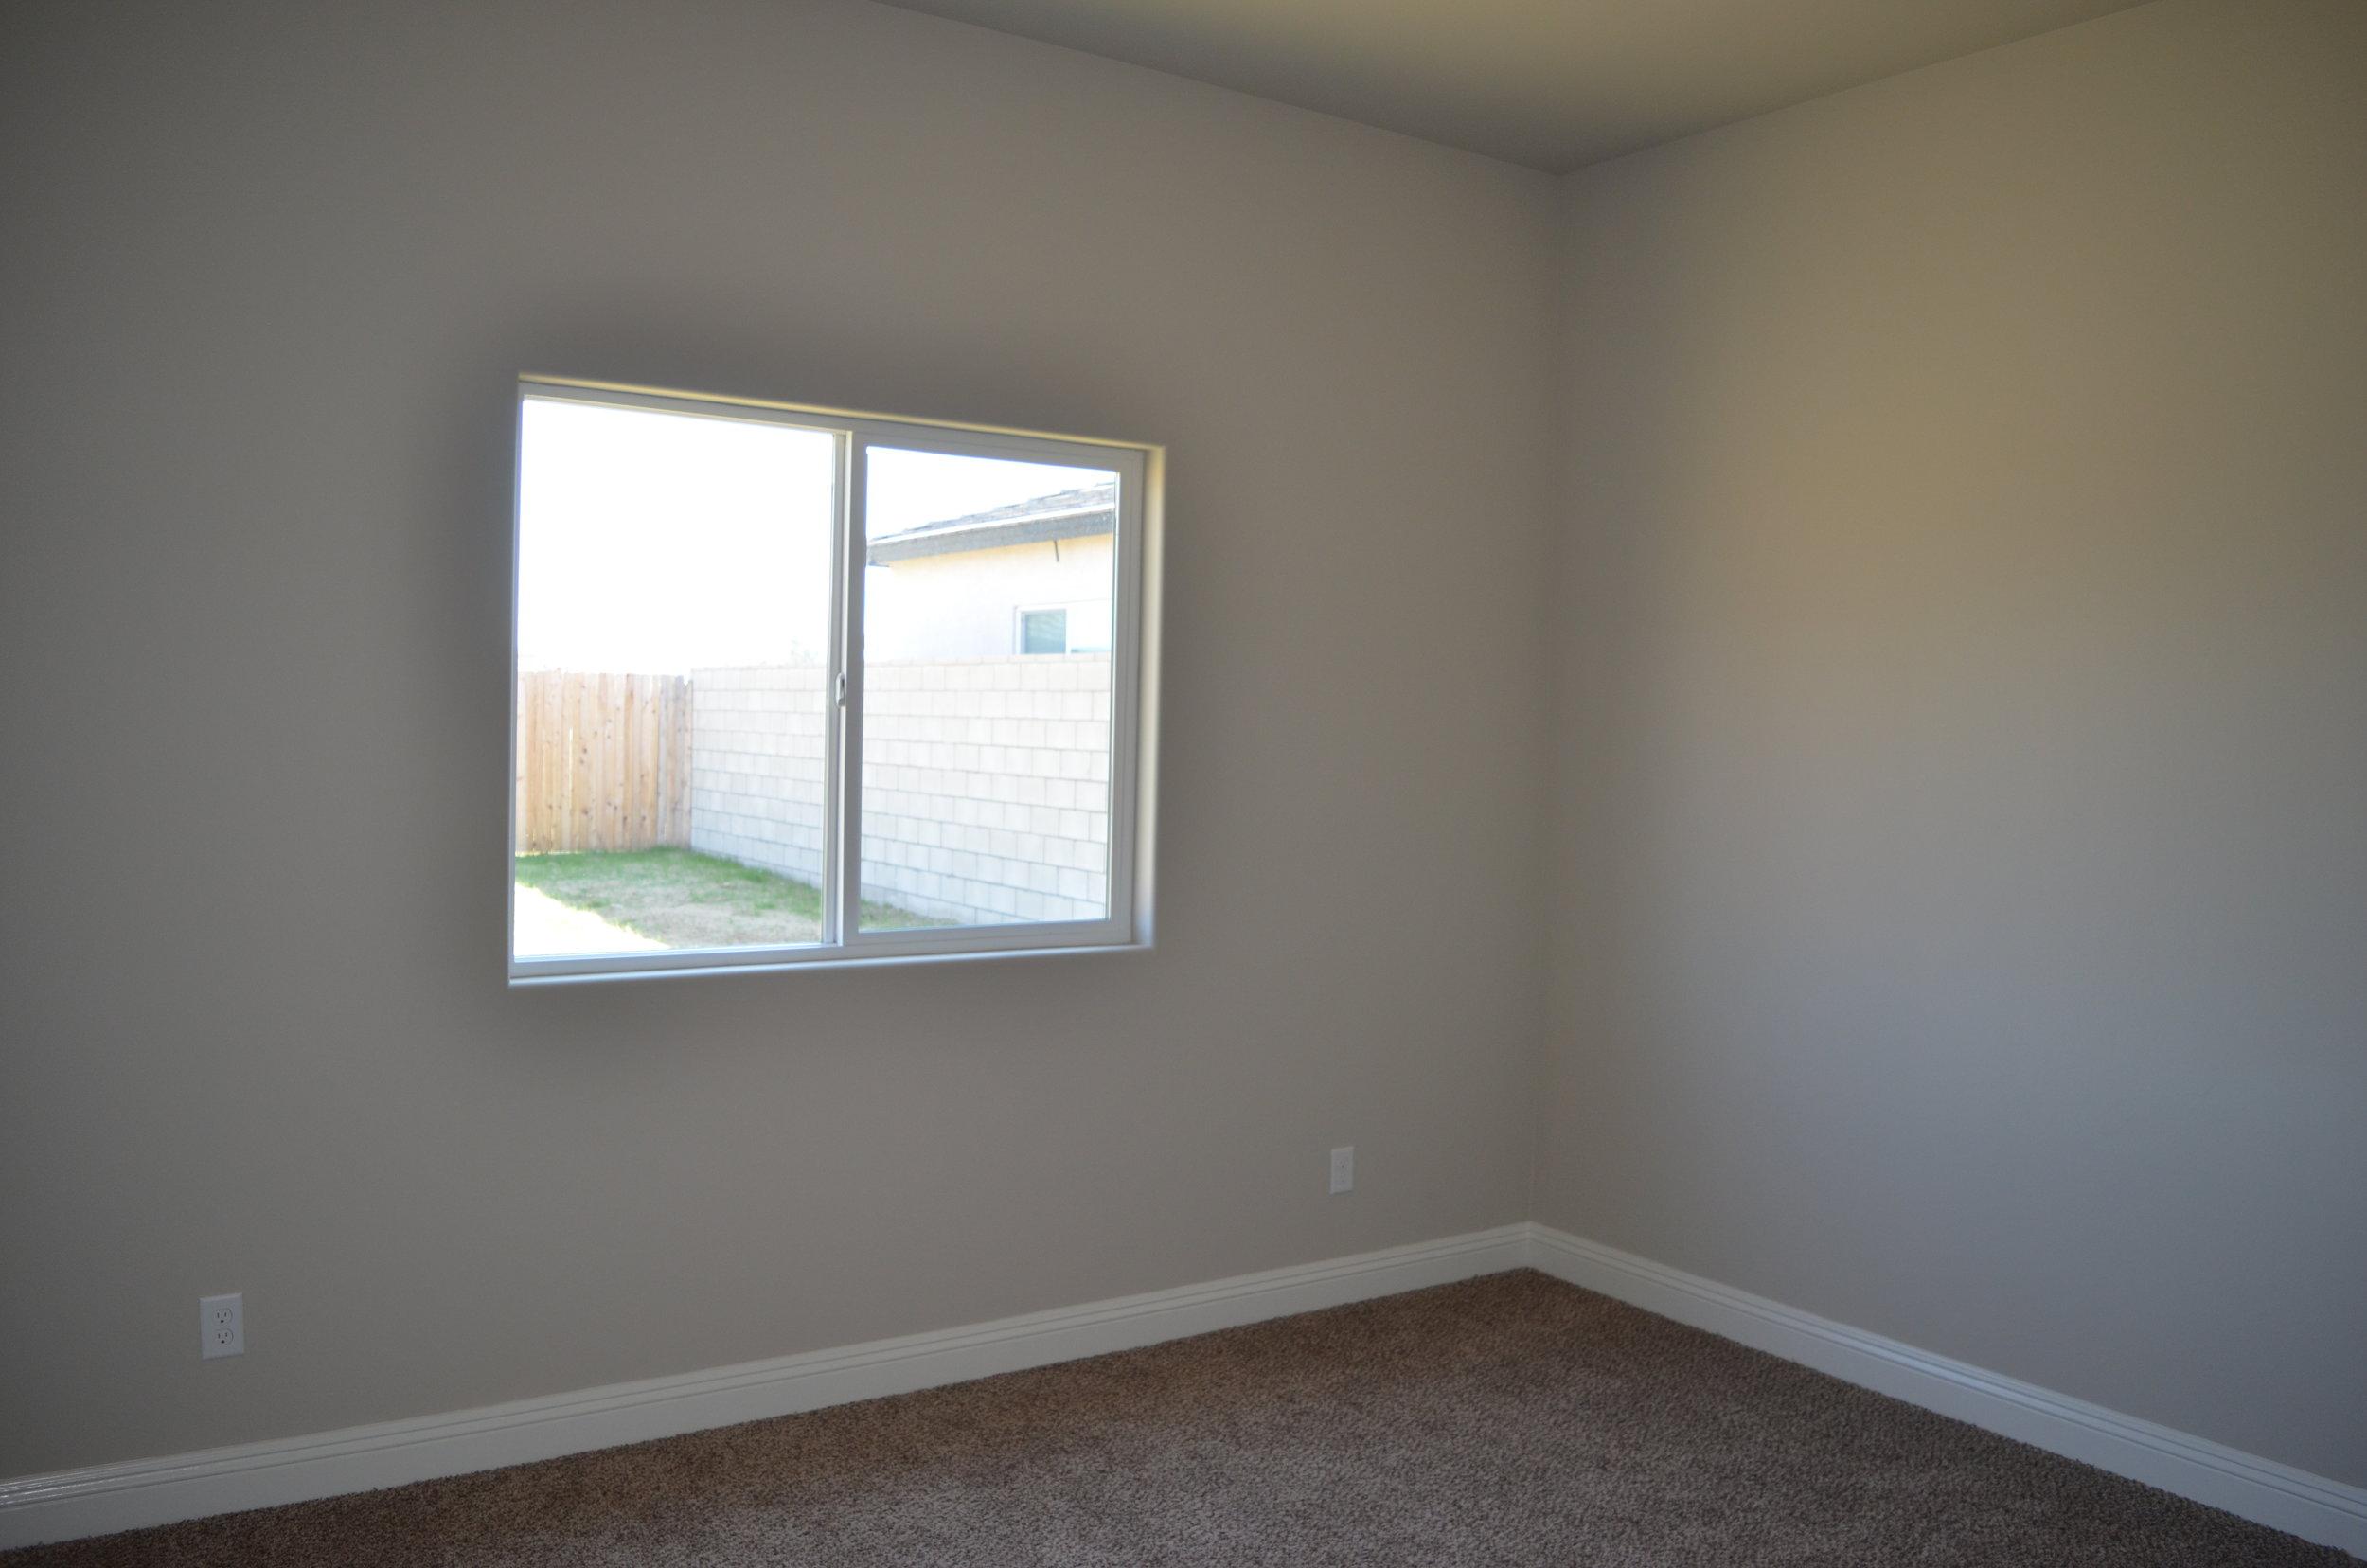 15 - Bedroom 2.JPG